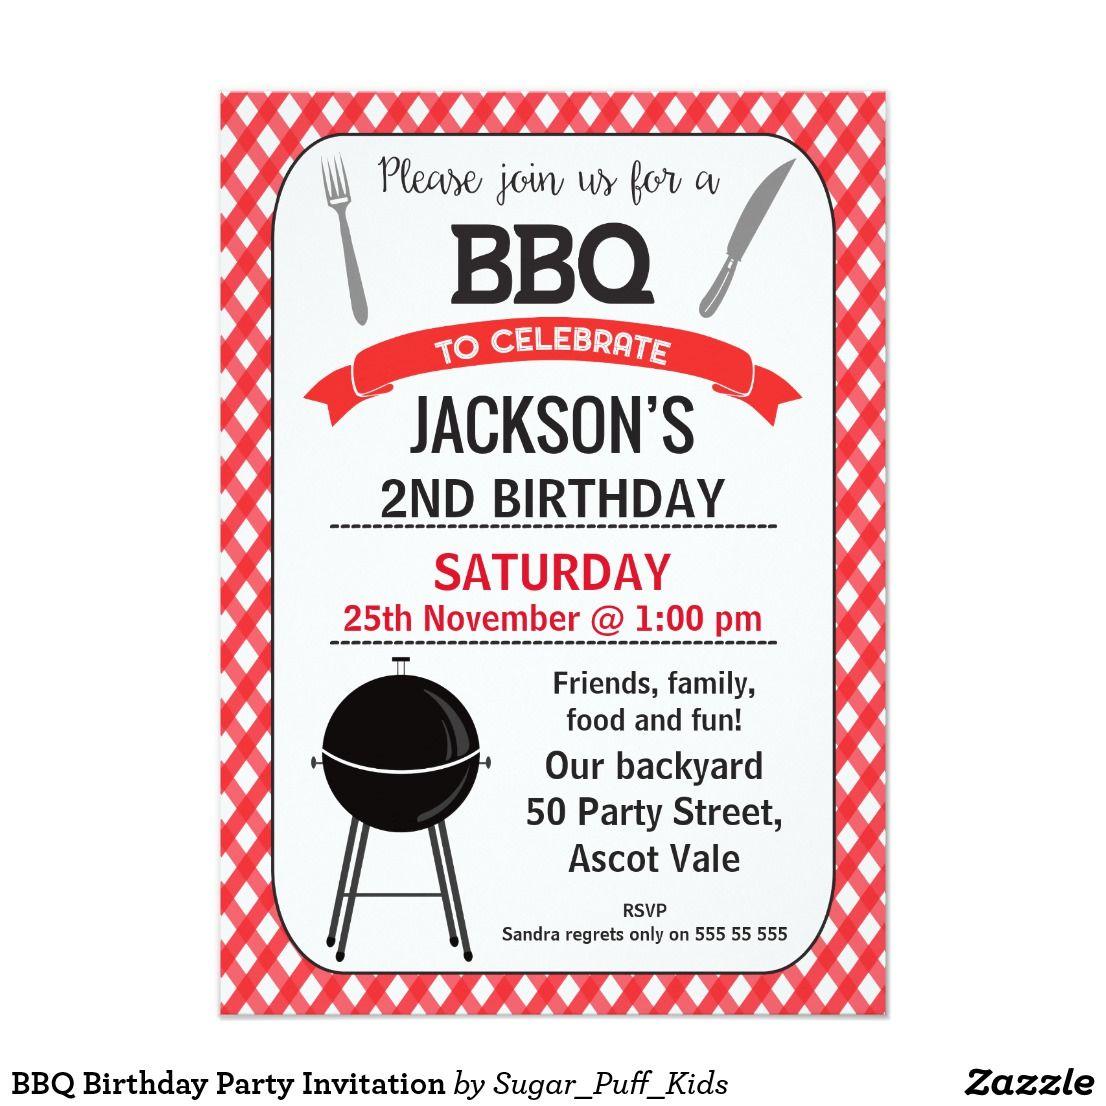 BBQ Birthday Party Invitation | Party invitations and Birthdays